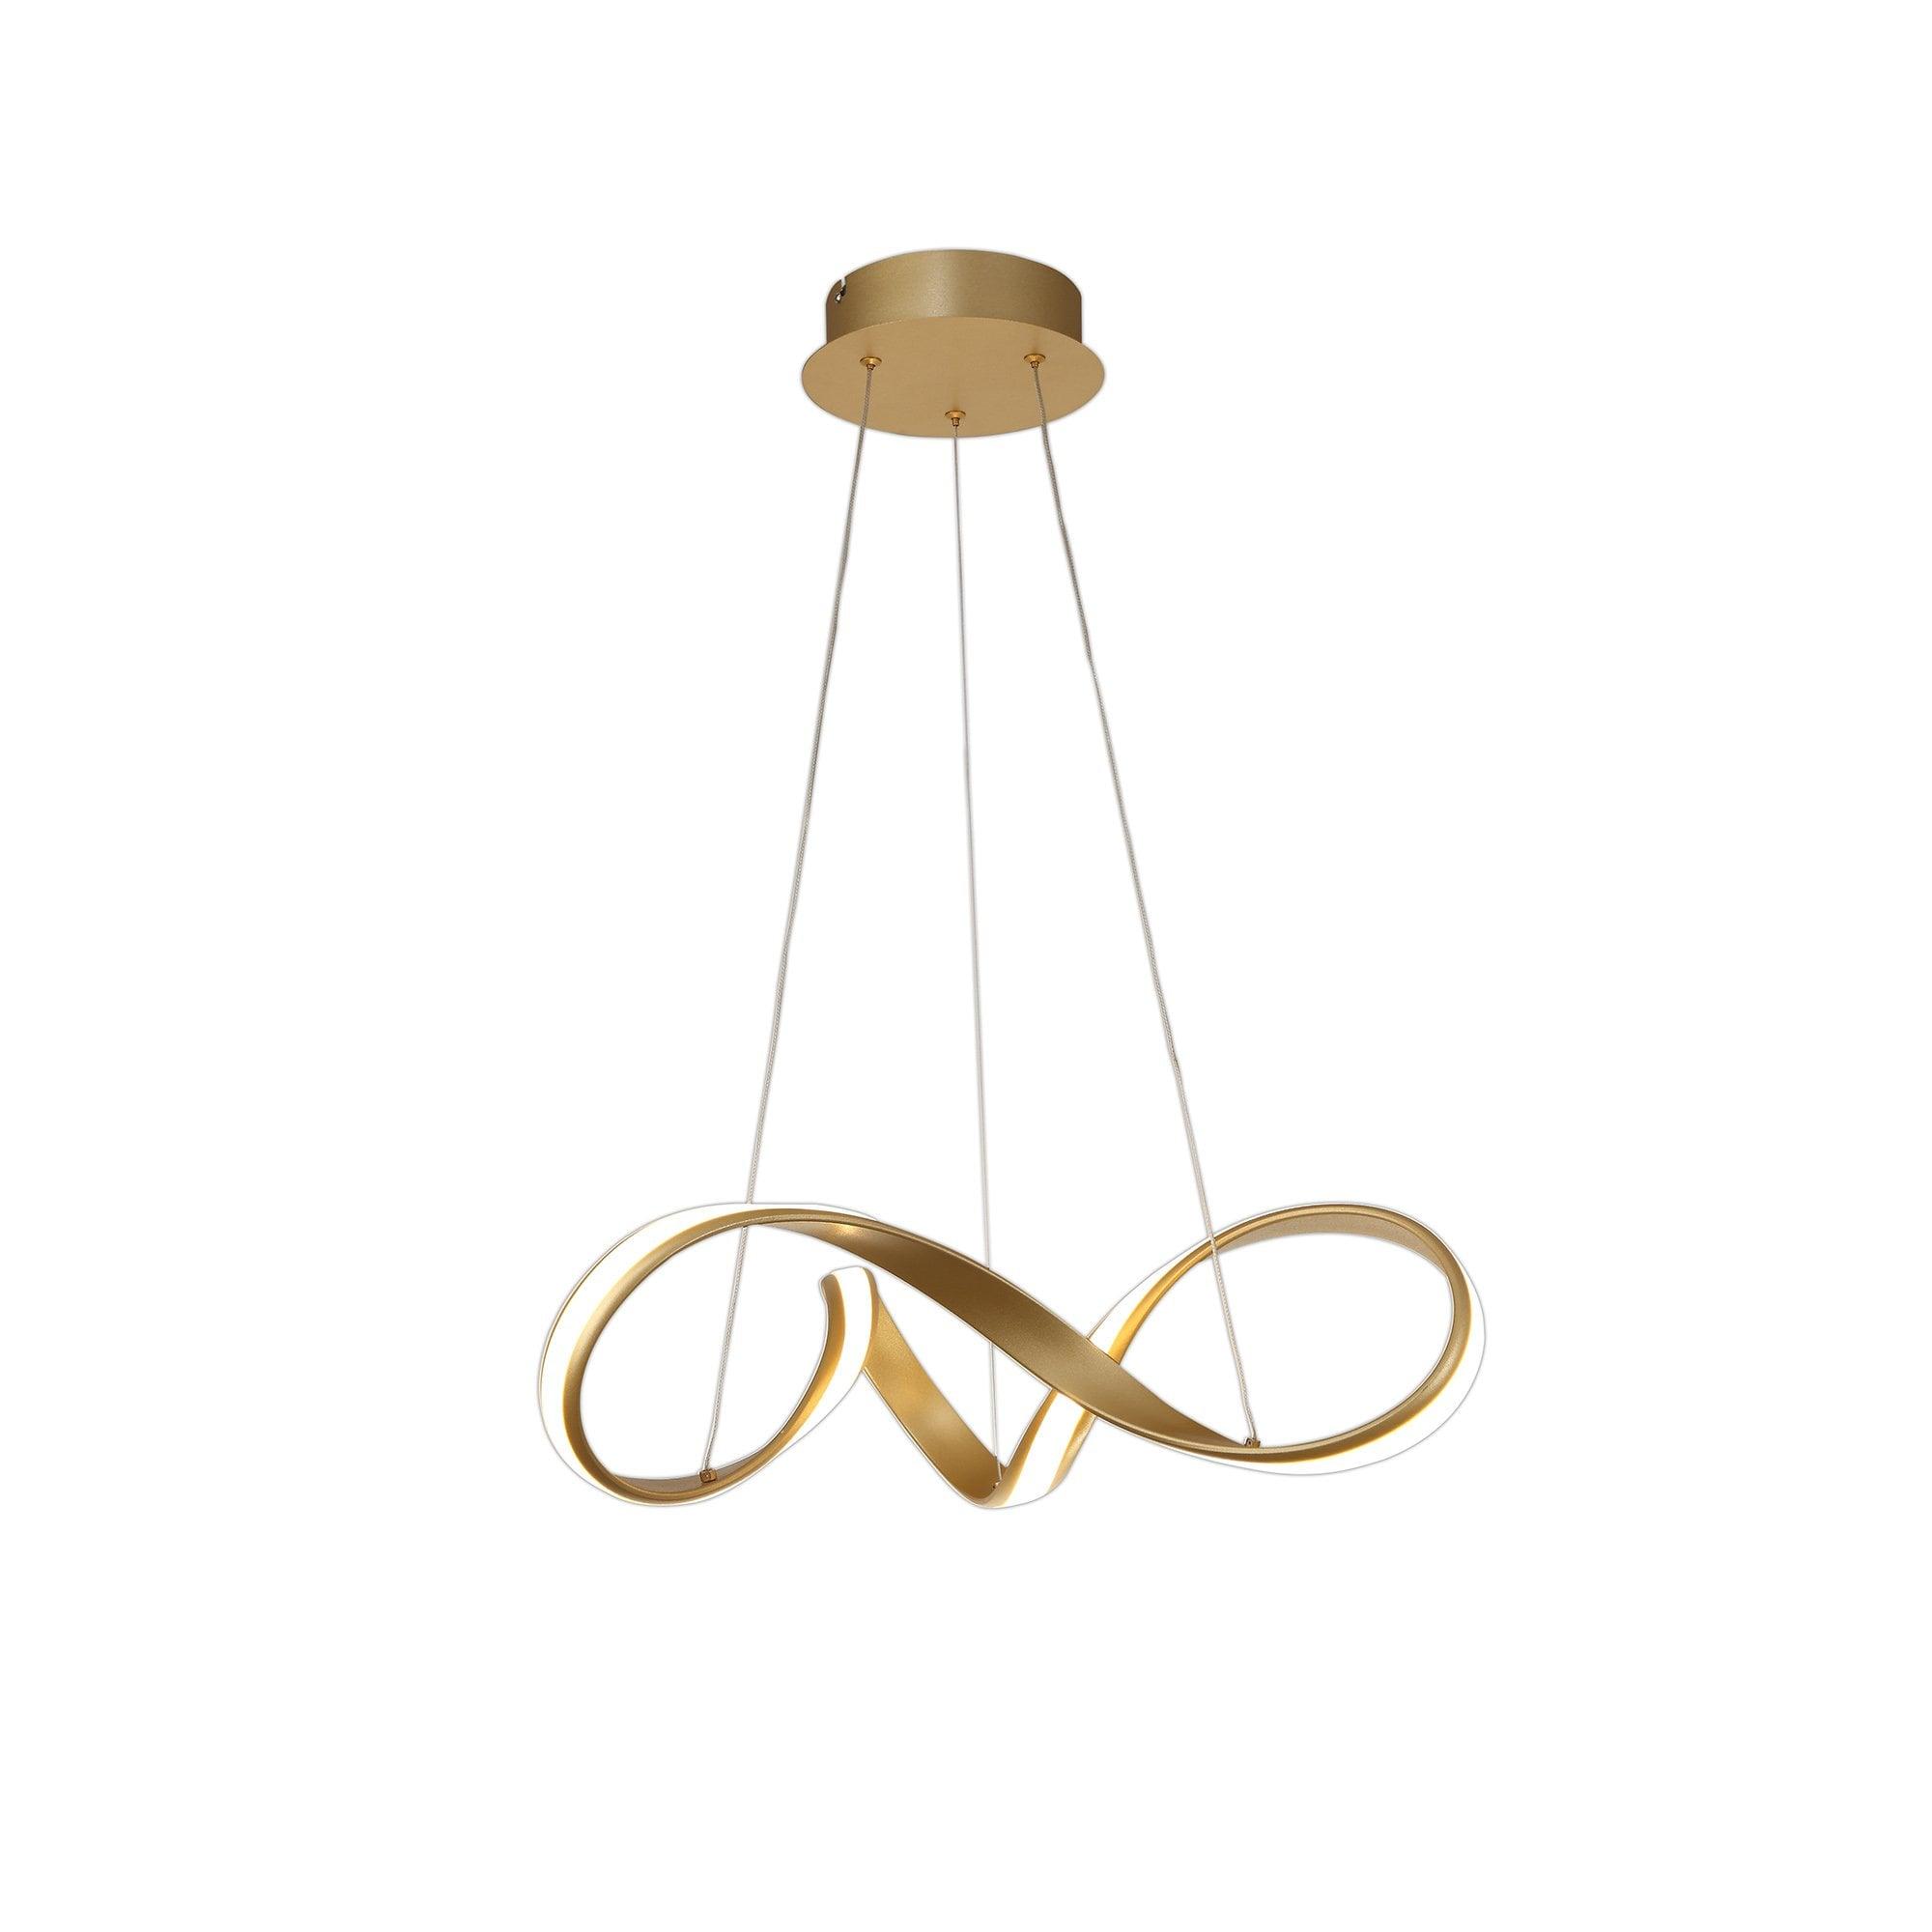 1 Light Ceiling Pendant Sand Gold Small